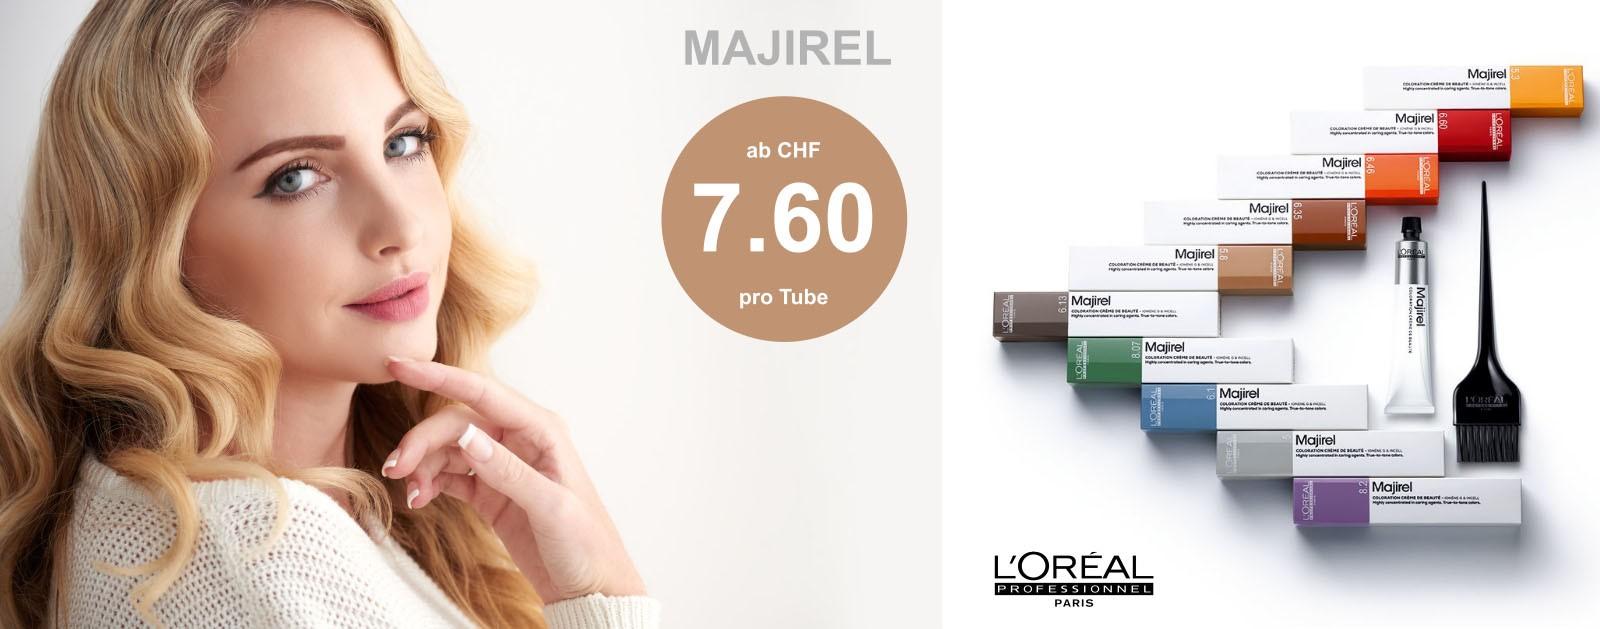 Majirel das beste Angebot